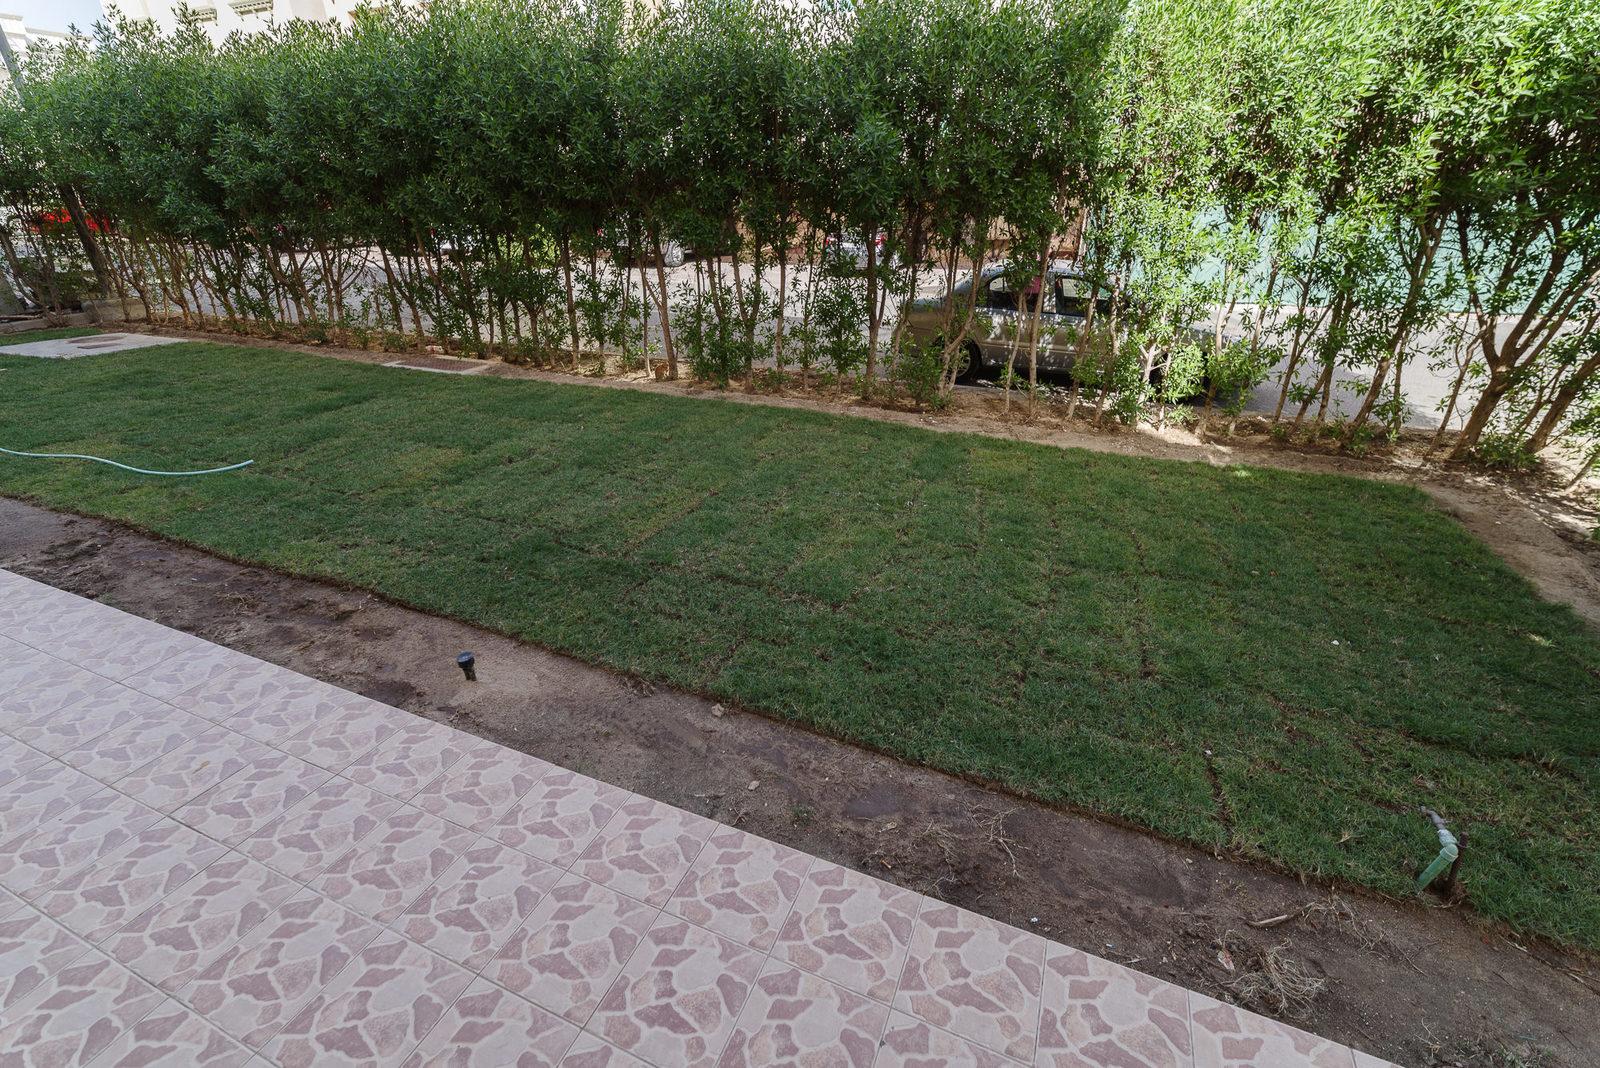 Fahad Al Ahmad – very spacious, unfurnished, five bedroom villa